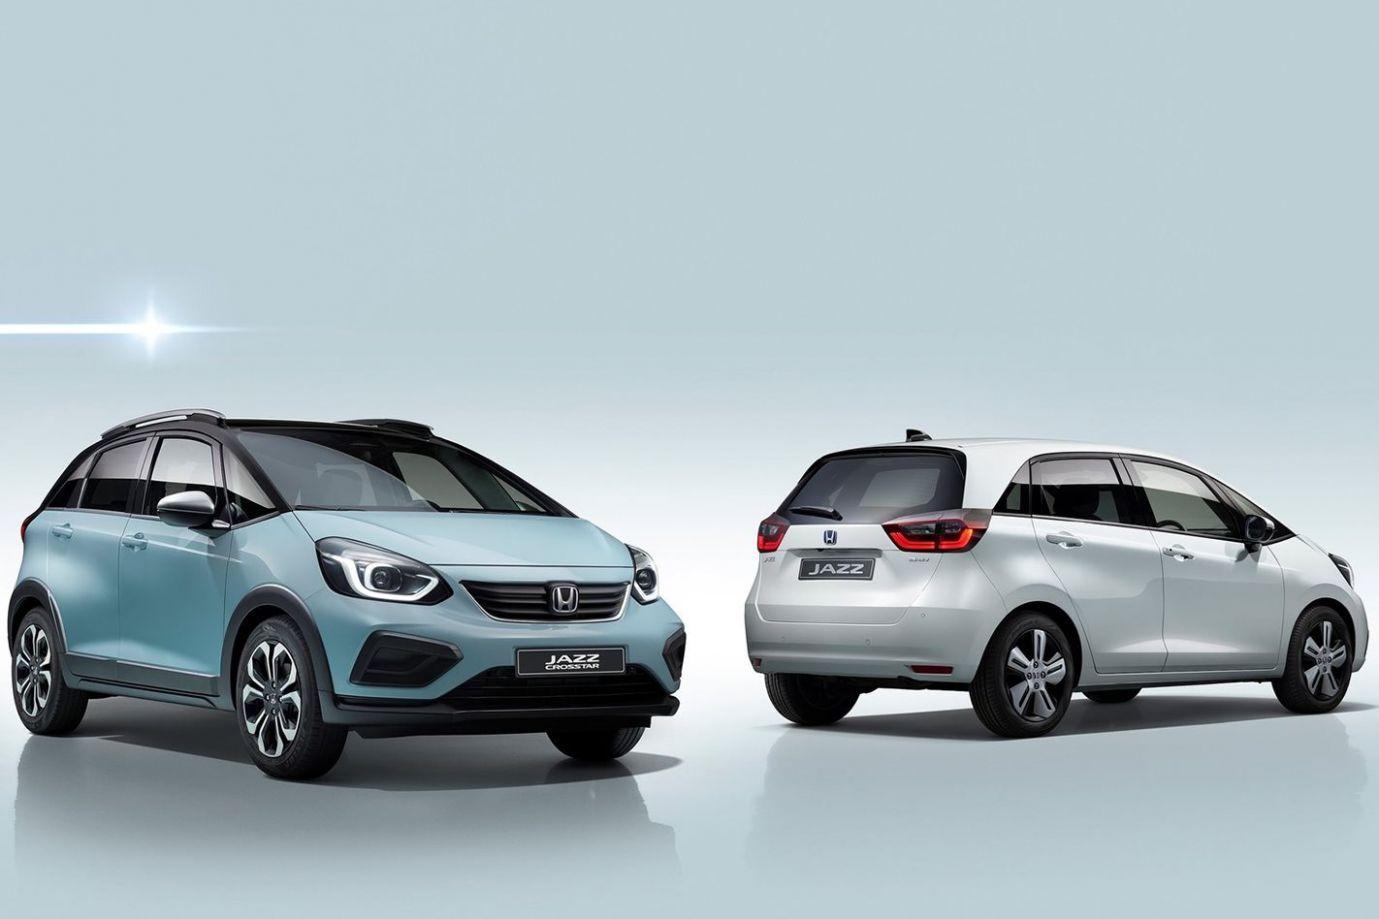 Honda Jazz 2021 Australia Price Design And Review In 2020 Modellen